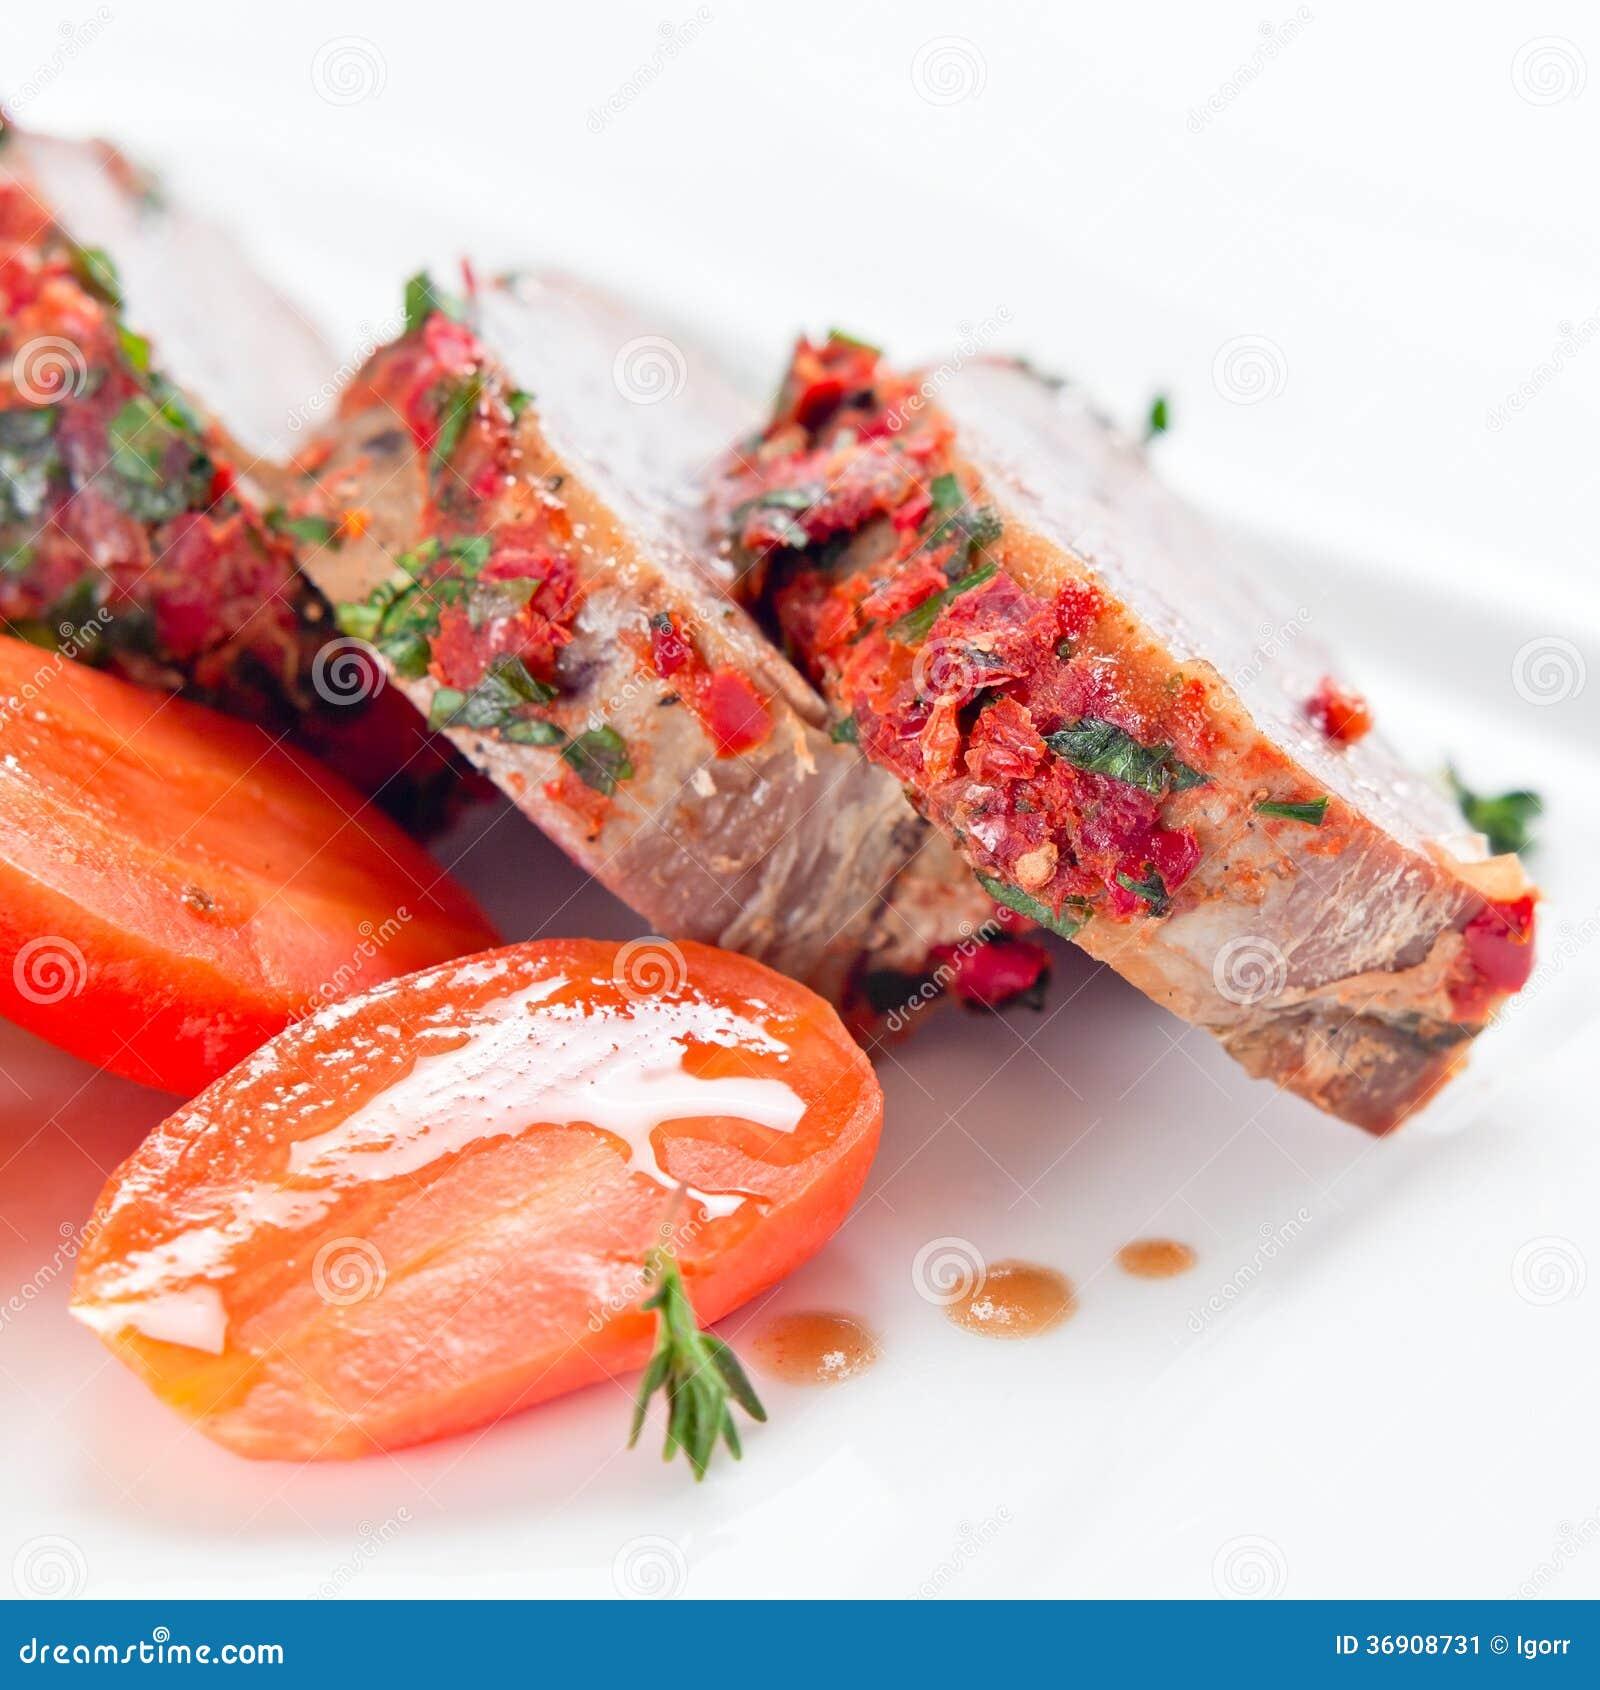 Stewed baranina